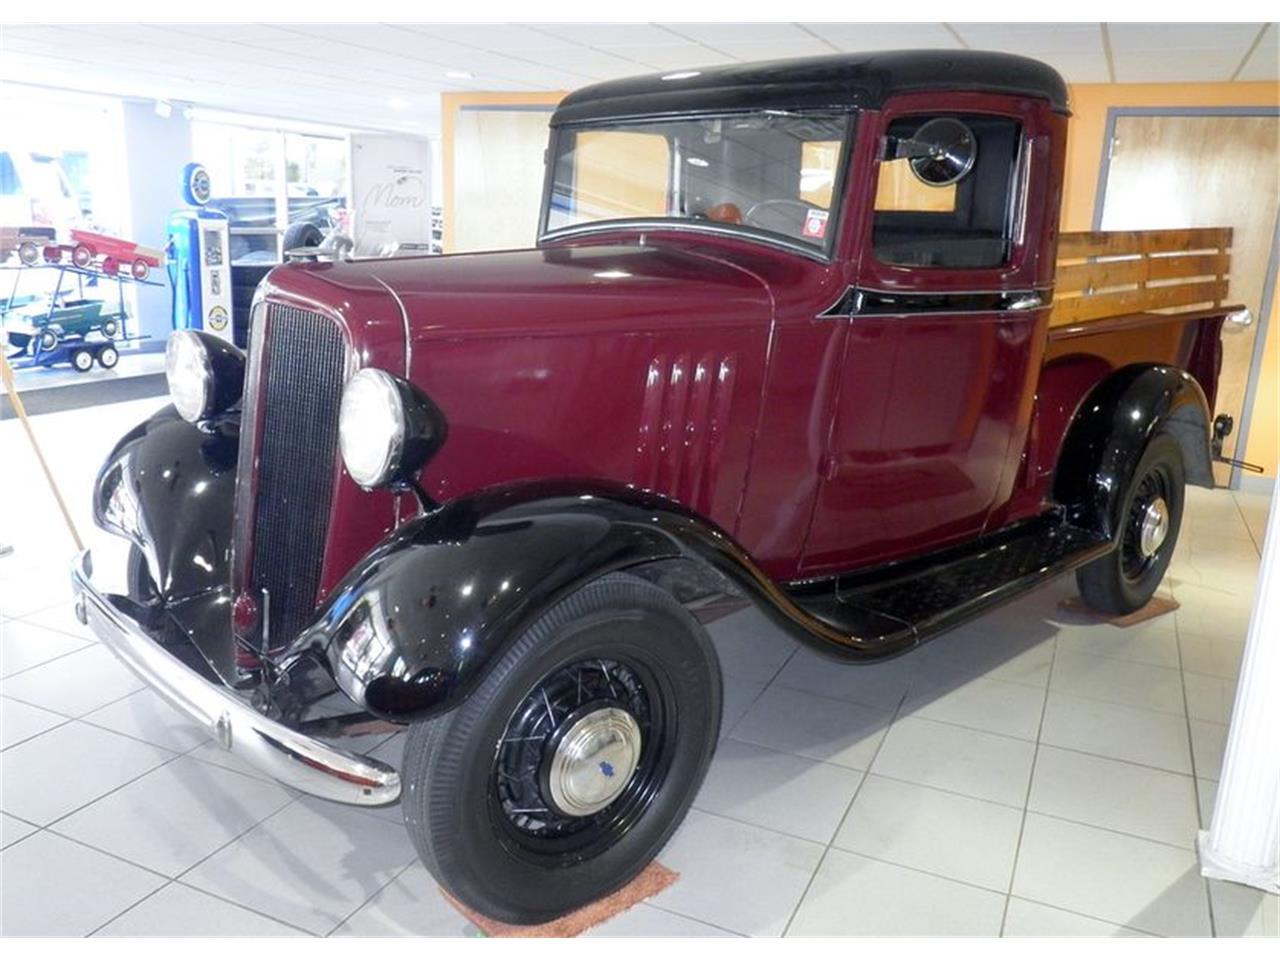 1935 Chevrolet Pickup for Sale   ClassicCars.com   CC-1076587